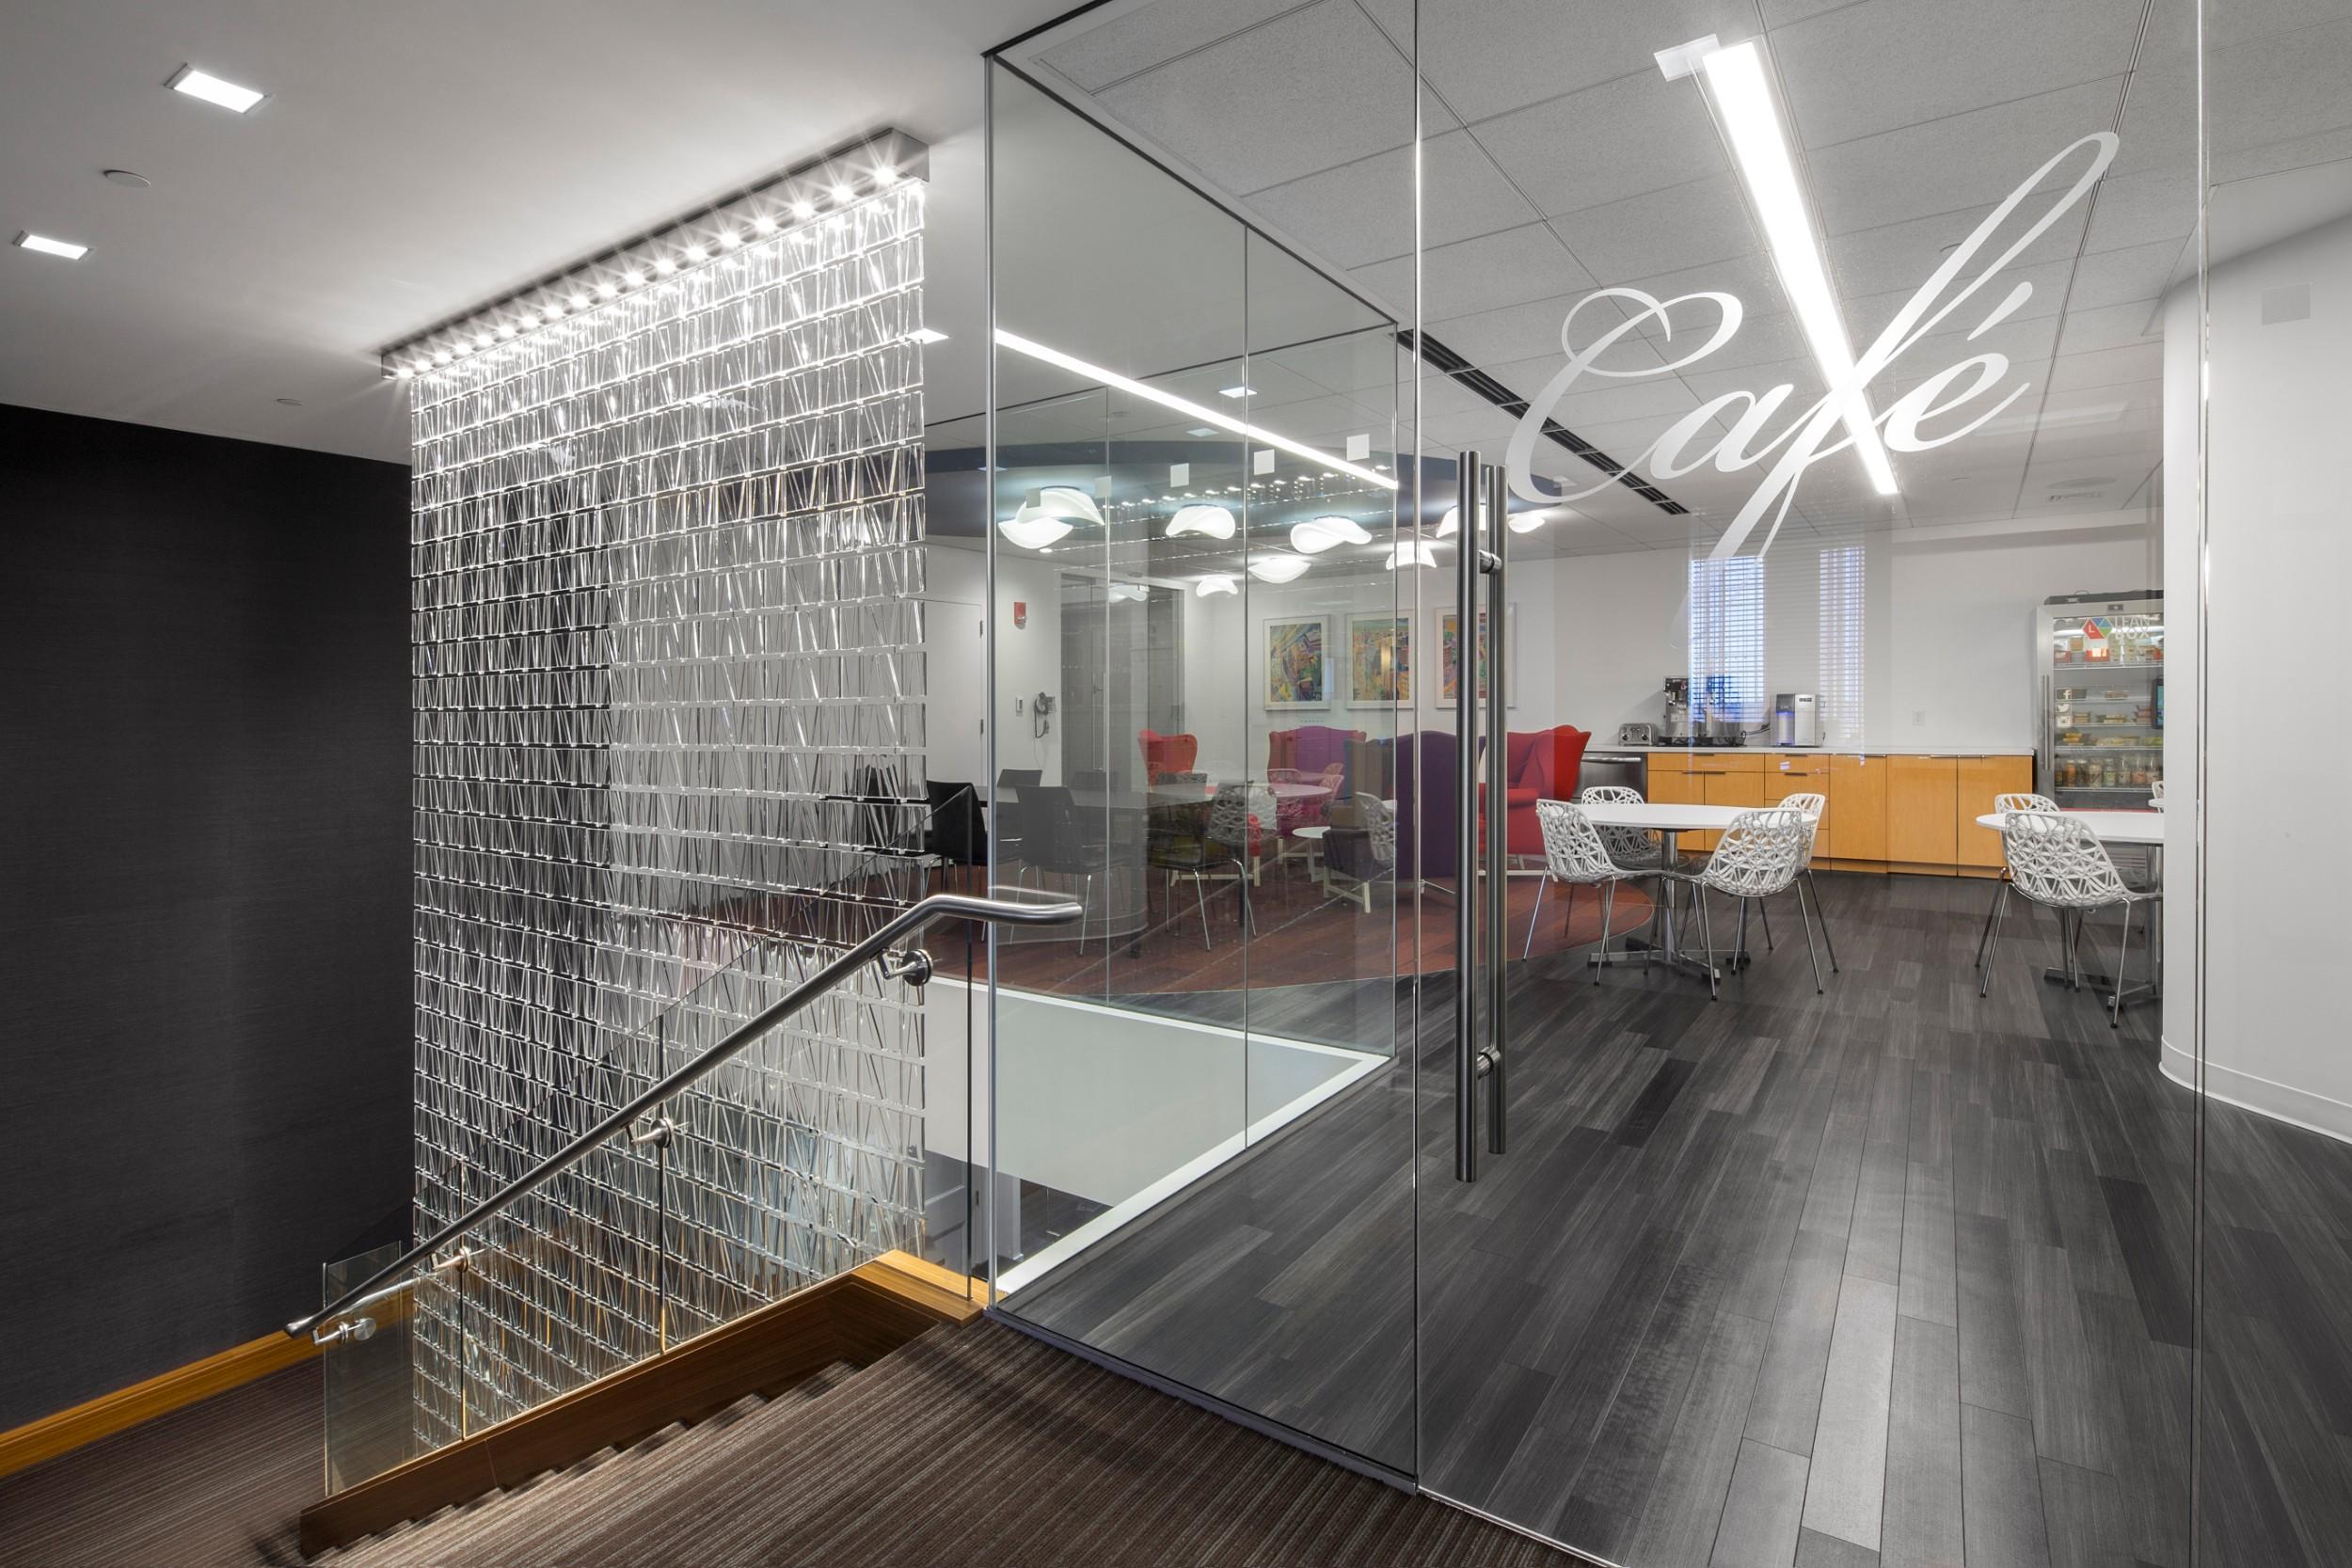 Corderman_Confidential_Exterior_Cafe_View_Interior_Construction Boston.jpg